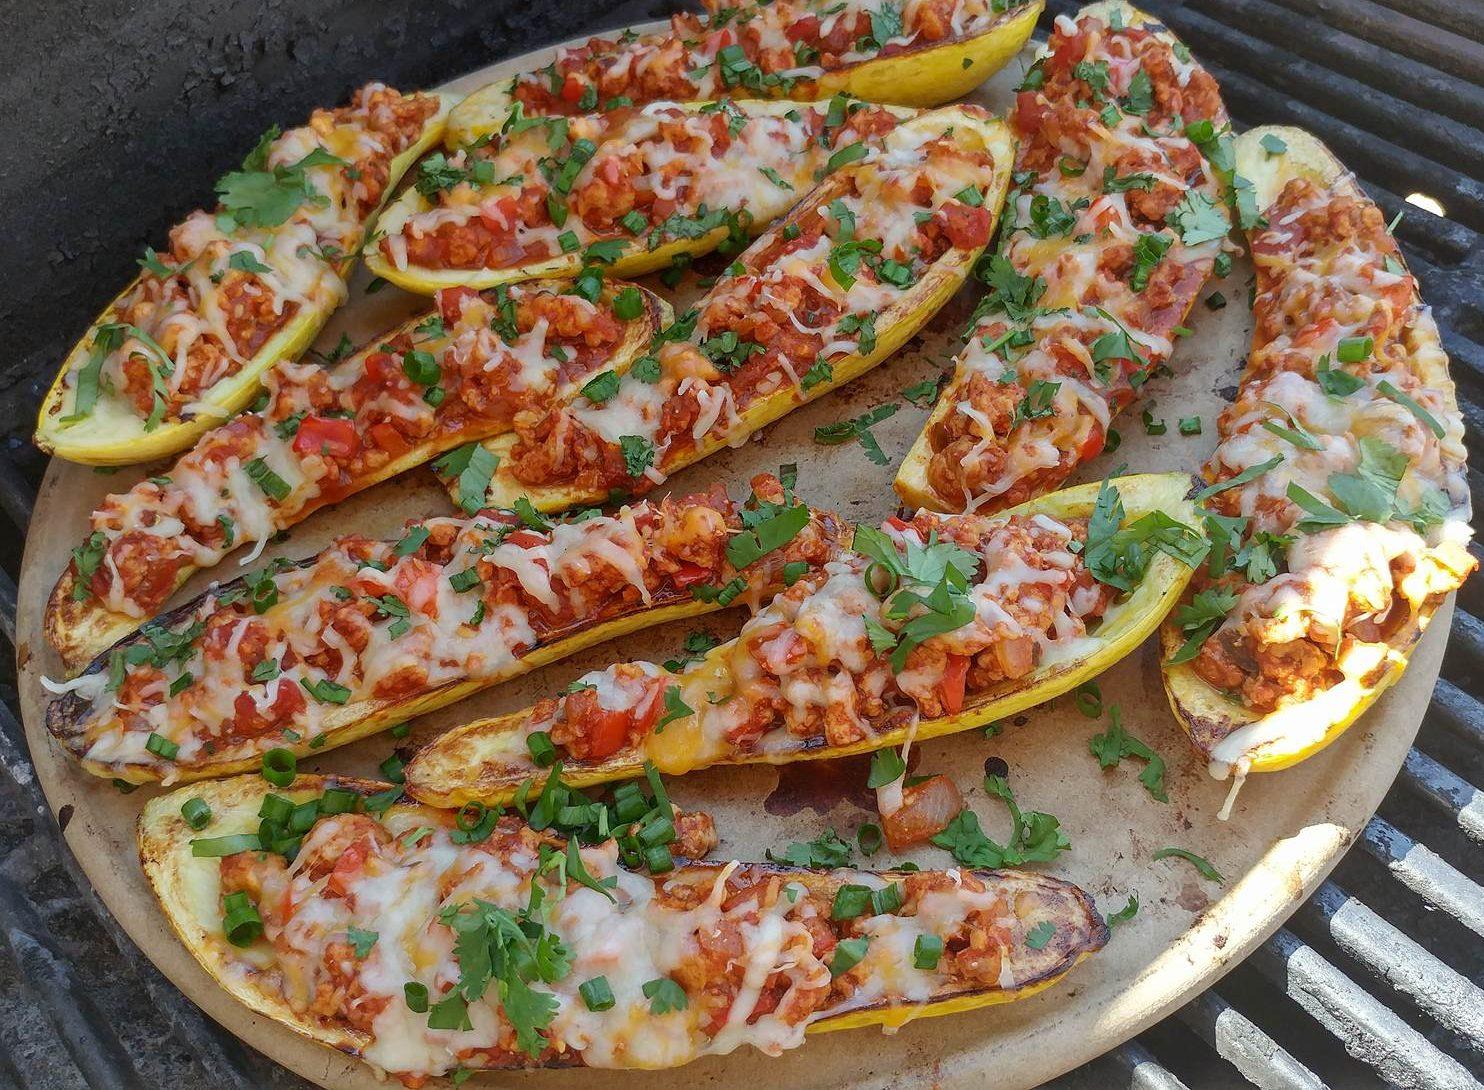 Taco Stuffed Summer Squash Boats http://cleanfoodcrush.com/taco-stuffed-squash/